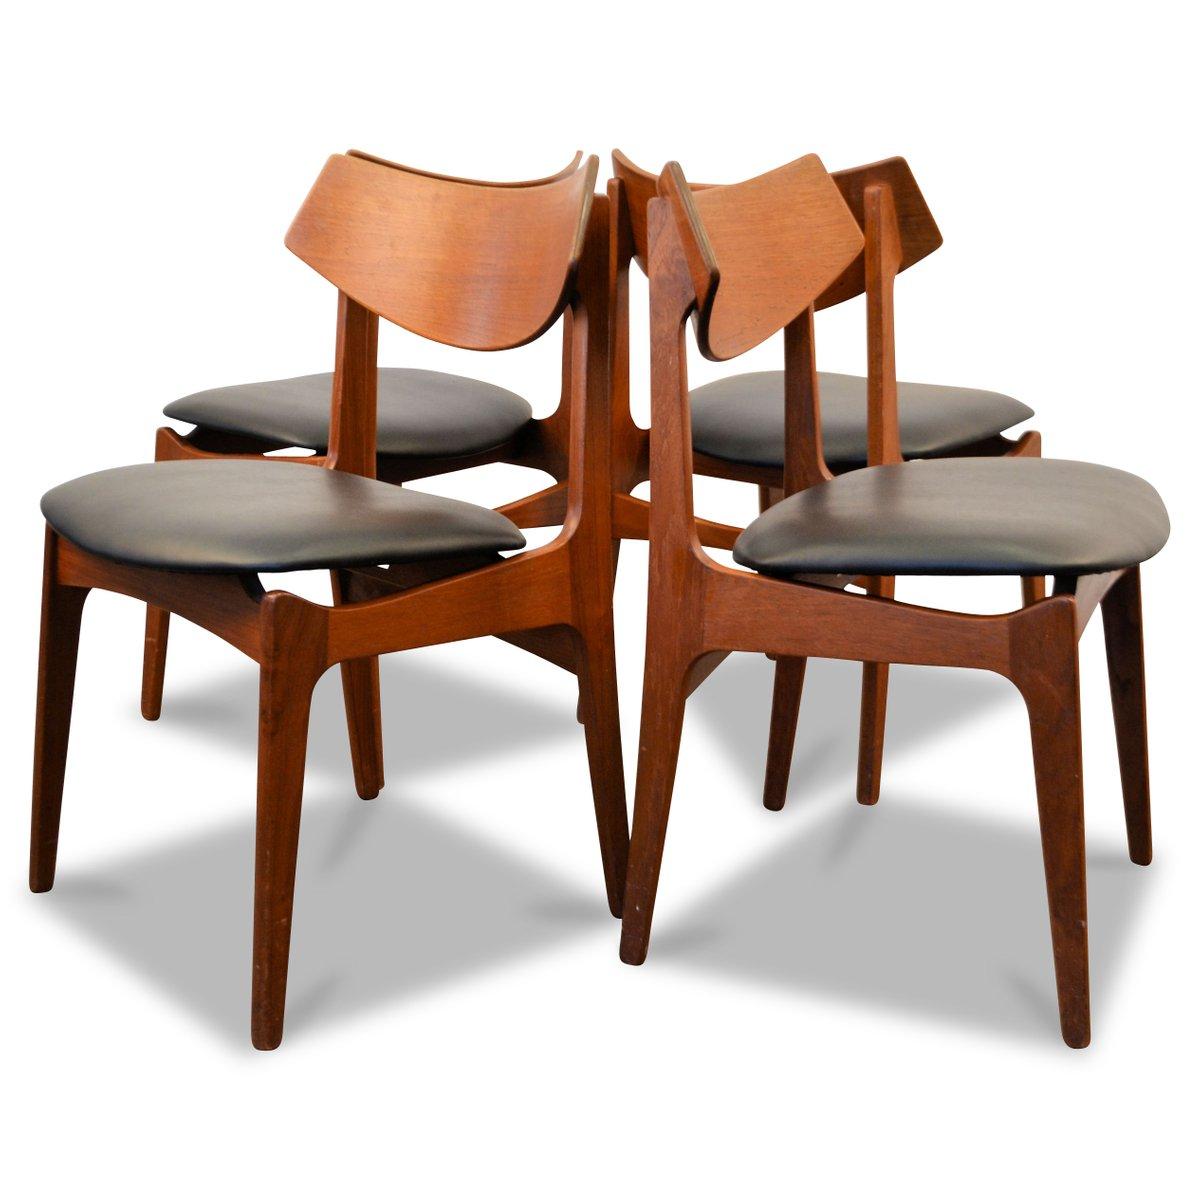 https://cdn10.pamono.com/p/z/c/o/cow65_1473335008108__1/danish-teak-dining-chairs-from-funder-schmidt-madsen-1960s-set-of-4-1.jpg